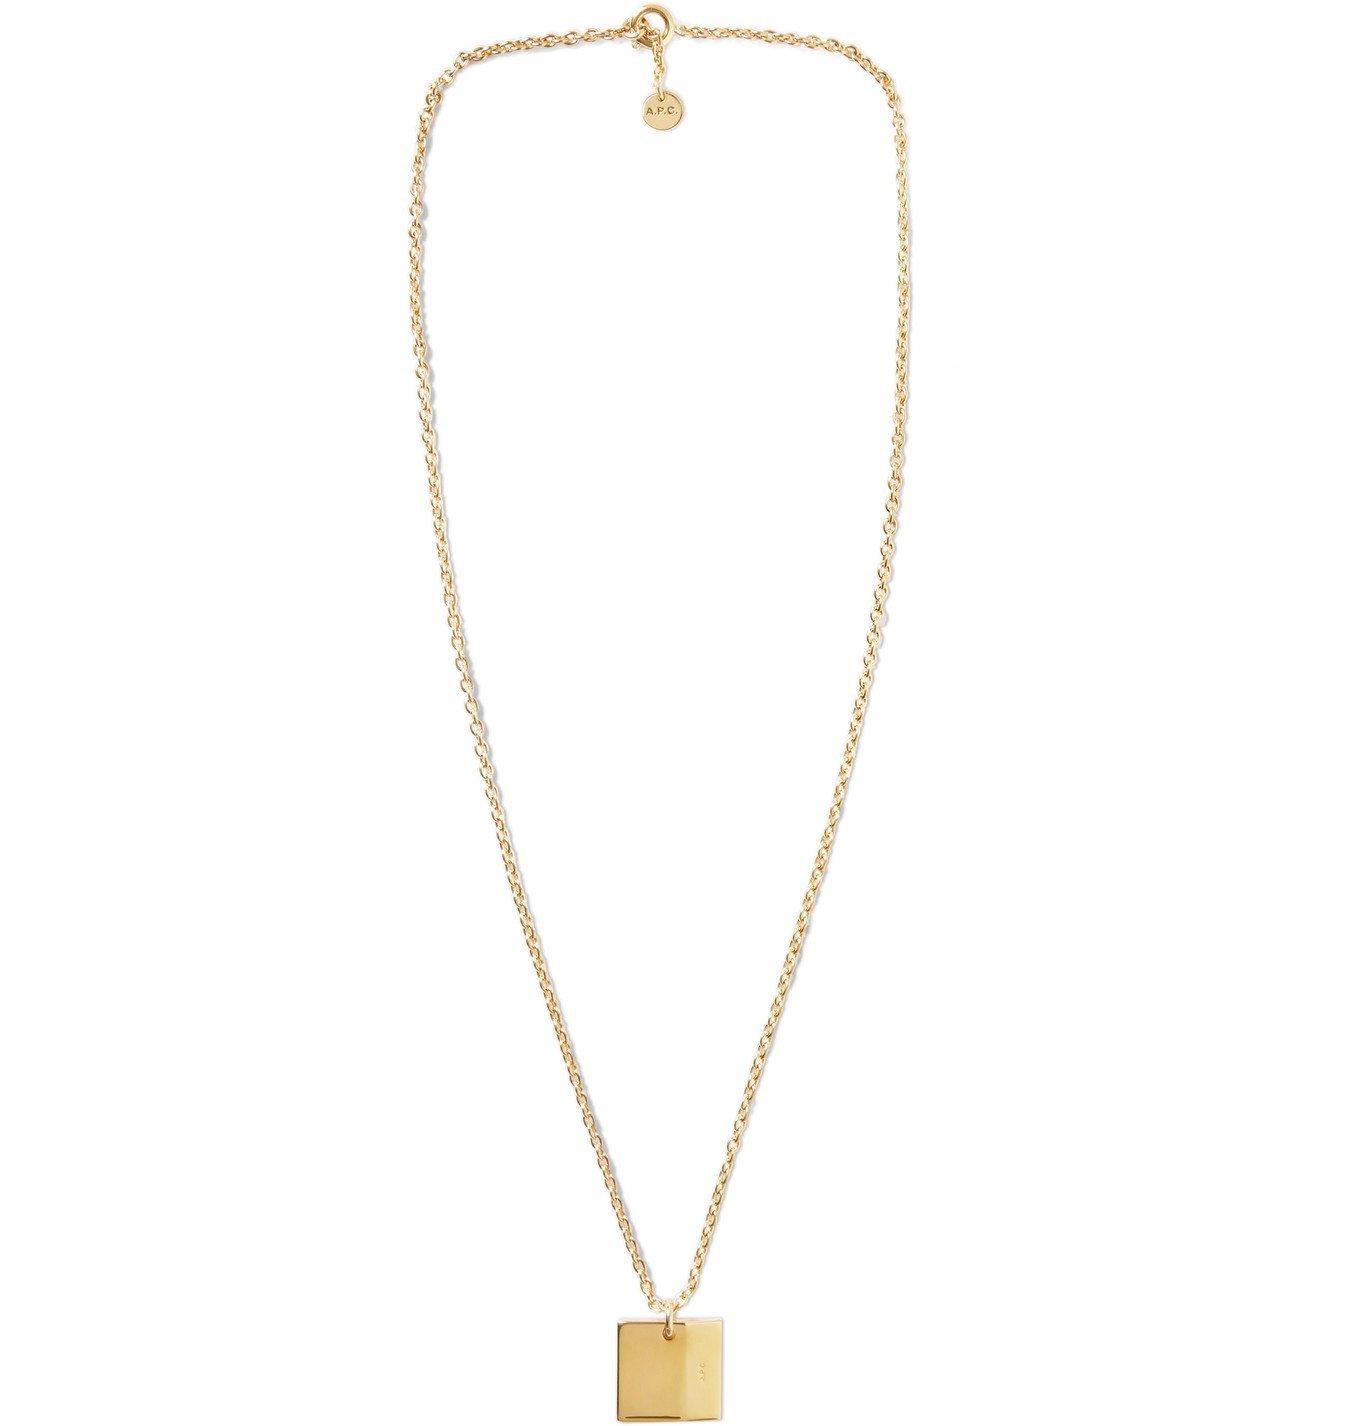 Photo: A.P.C. - Logo-Engraved Gold-Tone Necklace - Gold